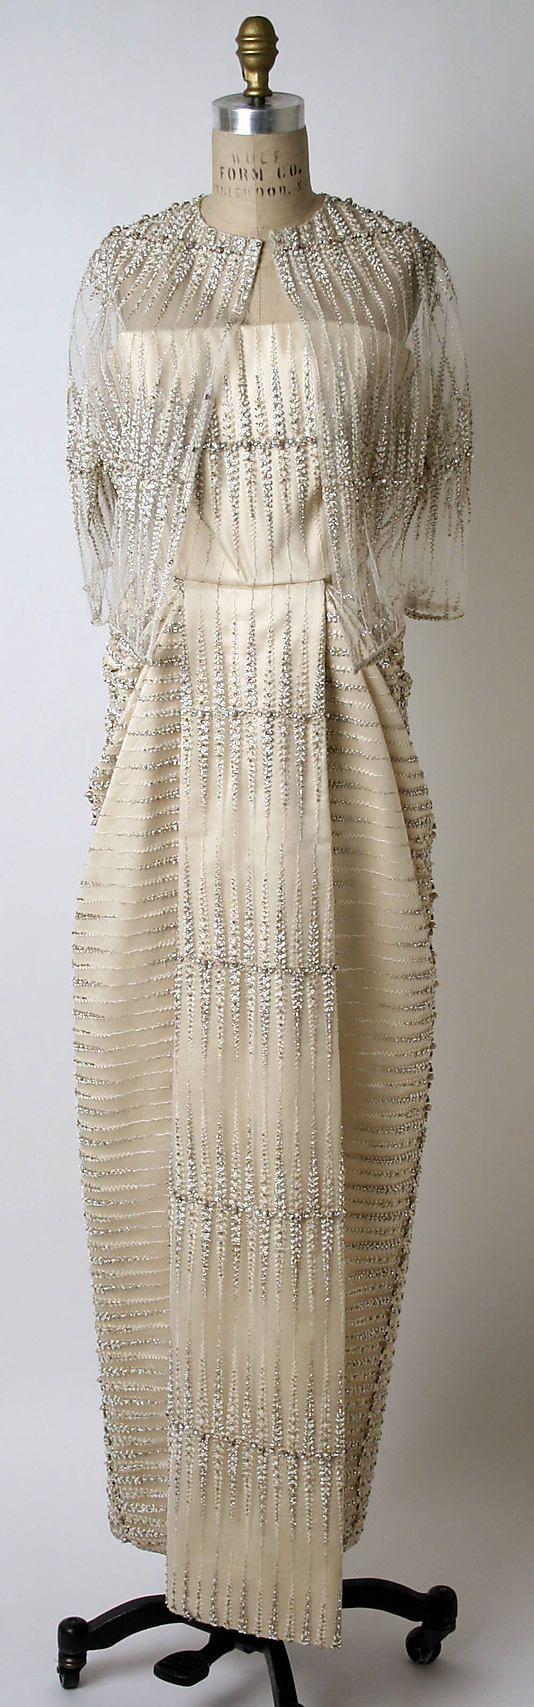 1961 Dress, Evening  James Galanos  (American, born Philadelphia, Pennsylvania, 1924)